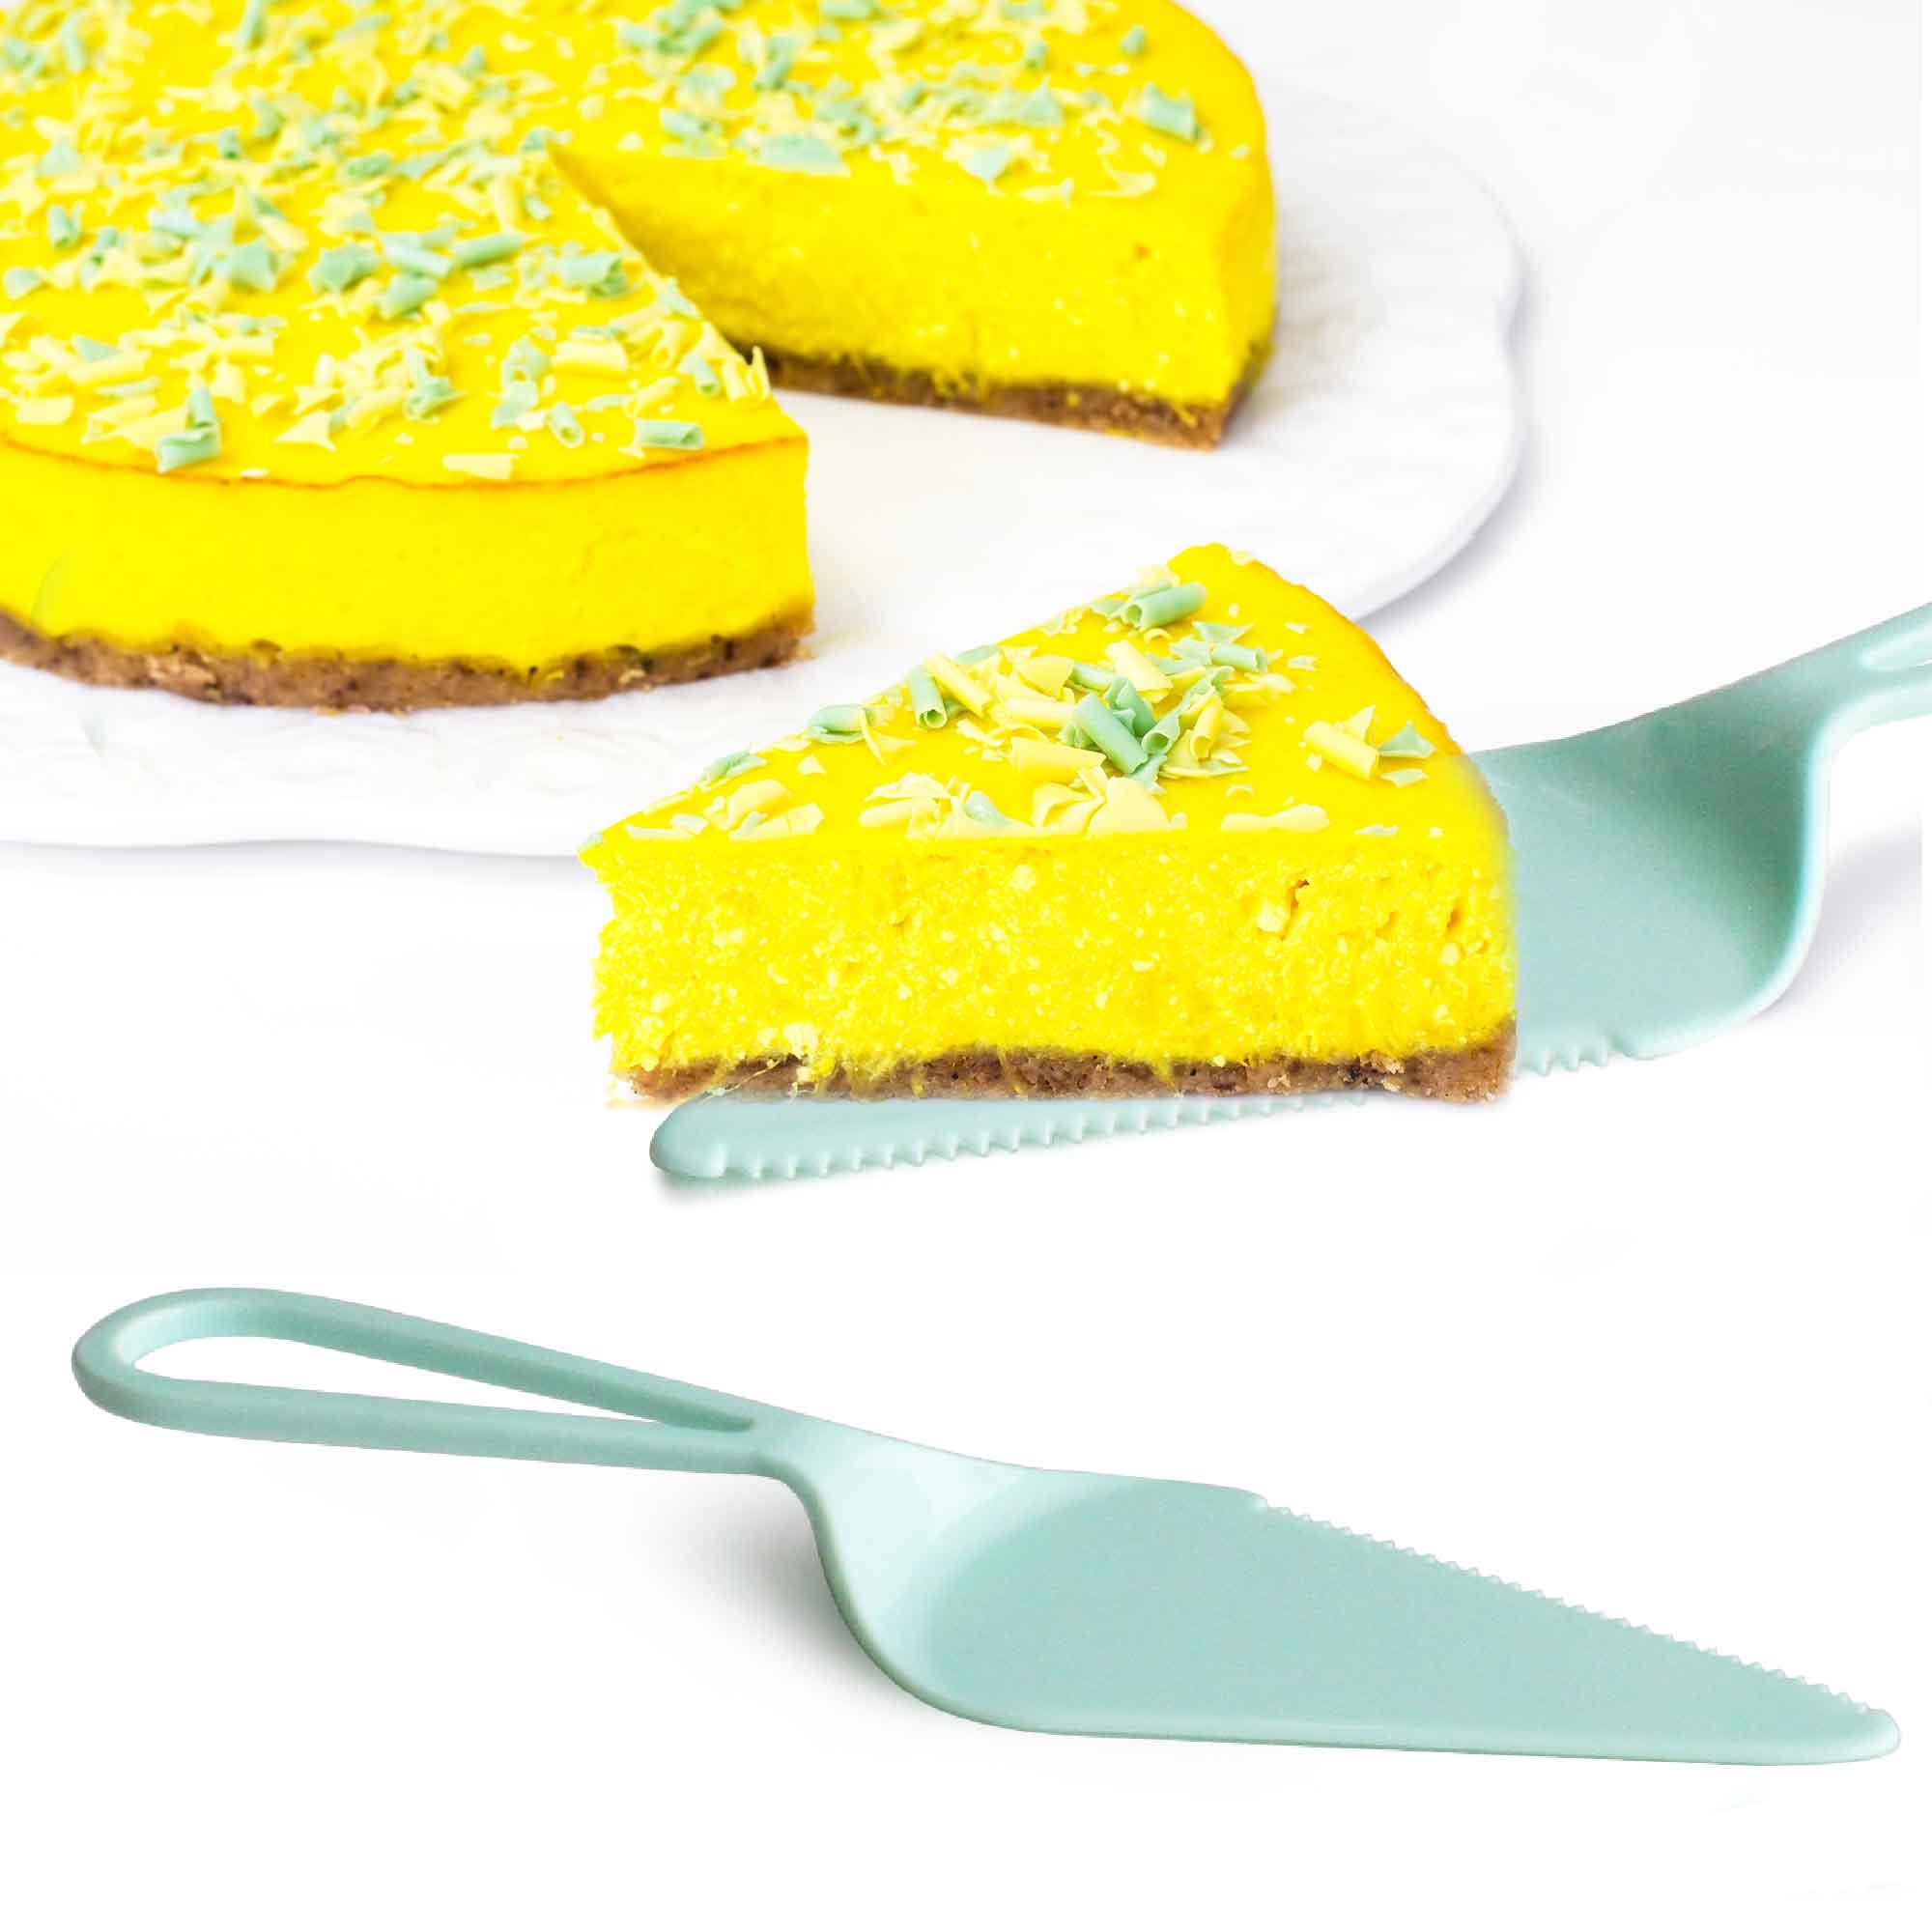 केक चाकू - केक चाकू